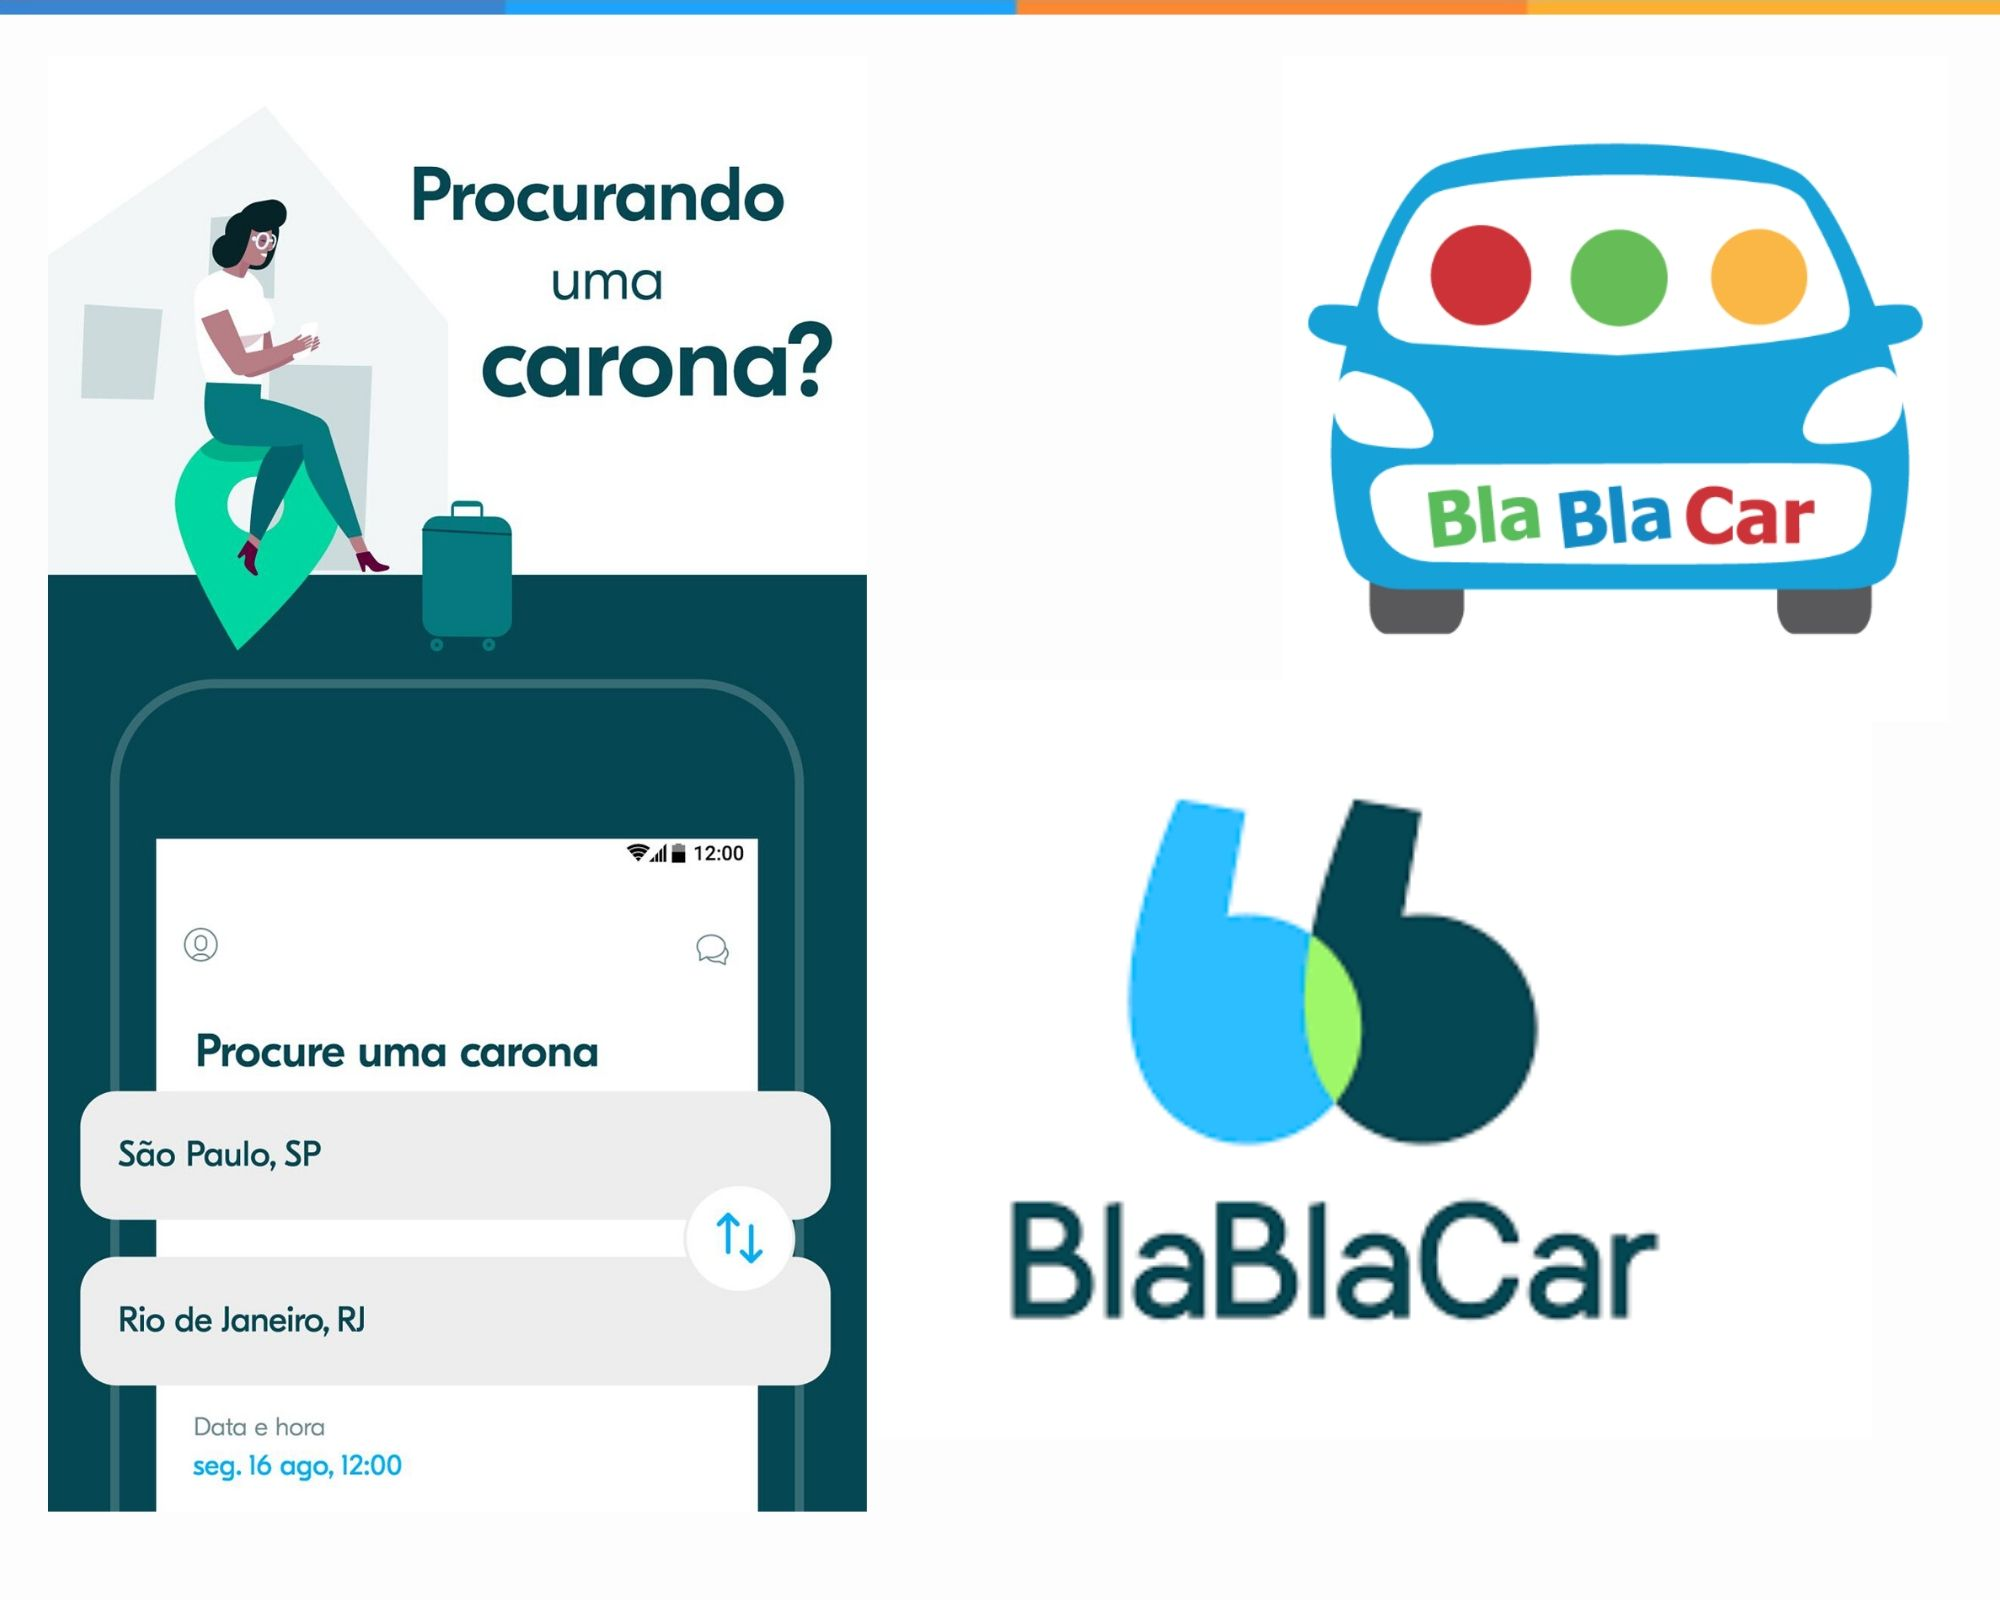 BlaBlaCar!